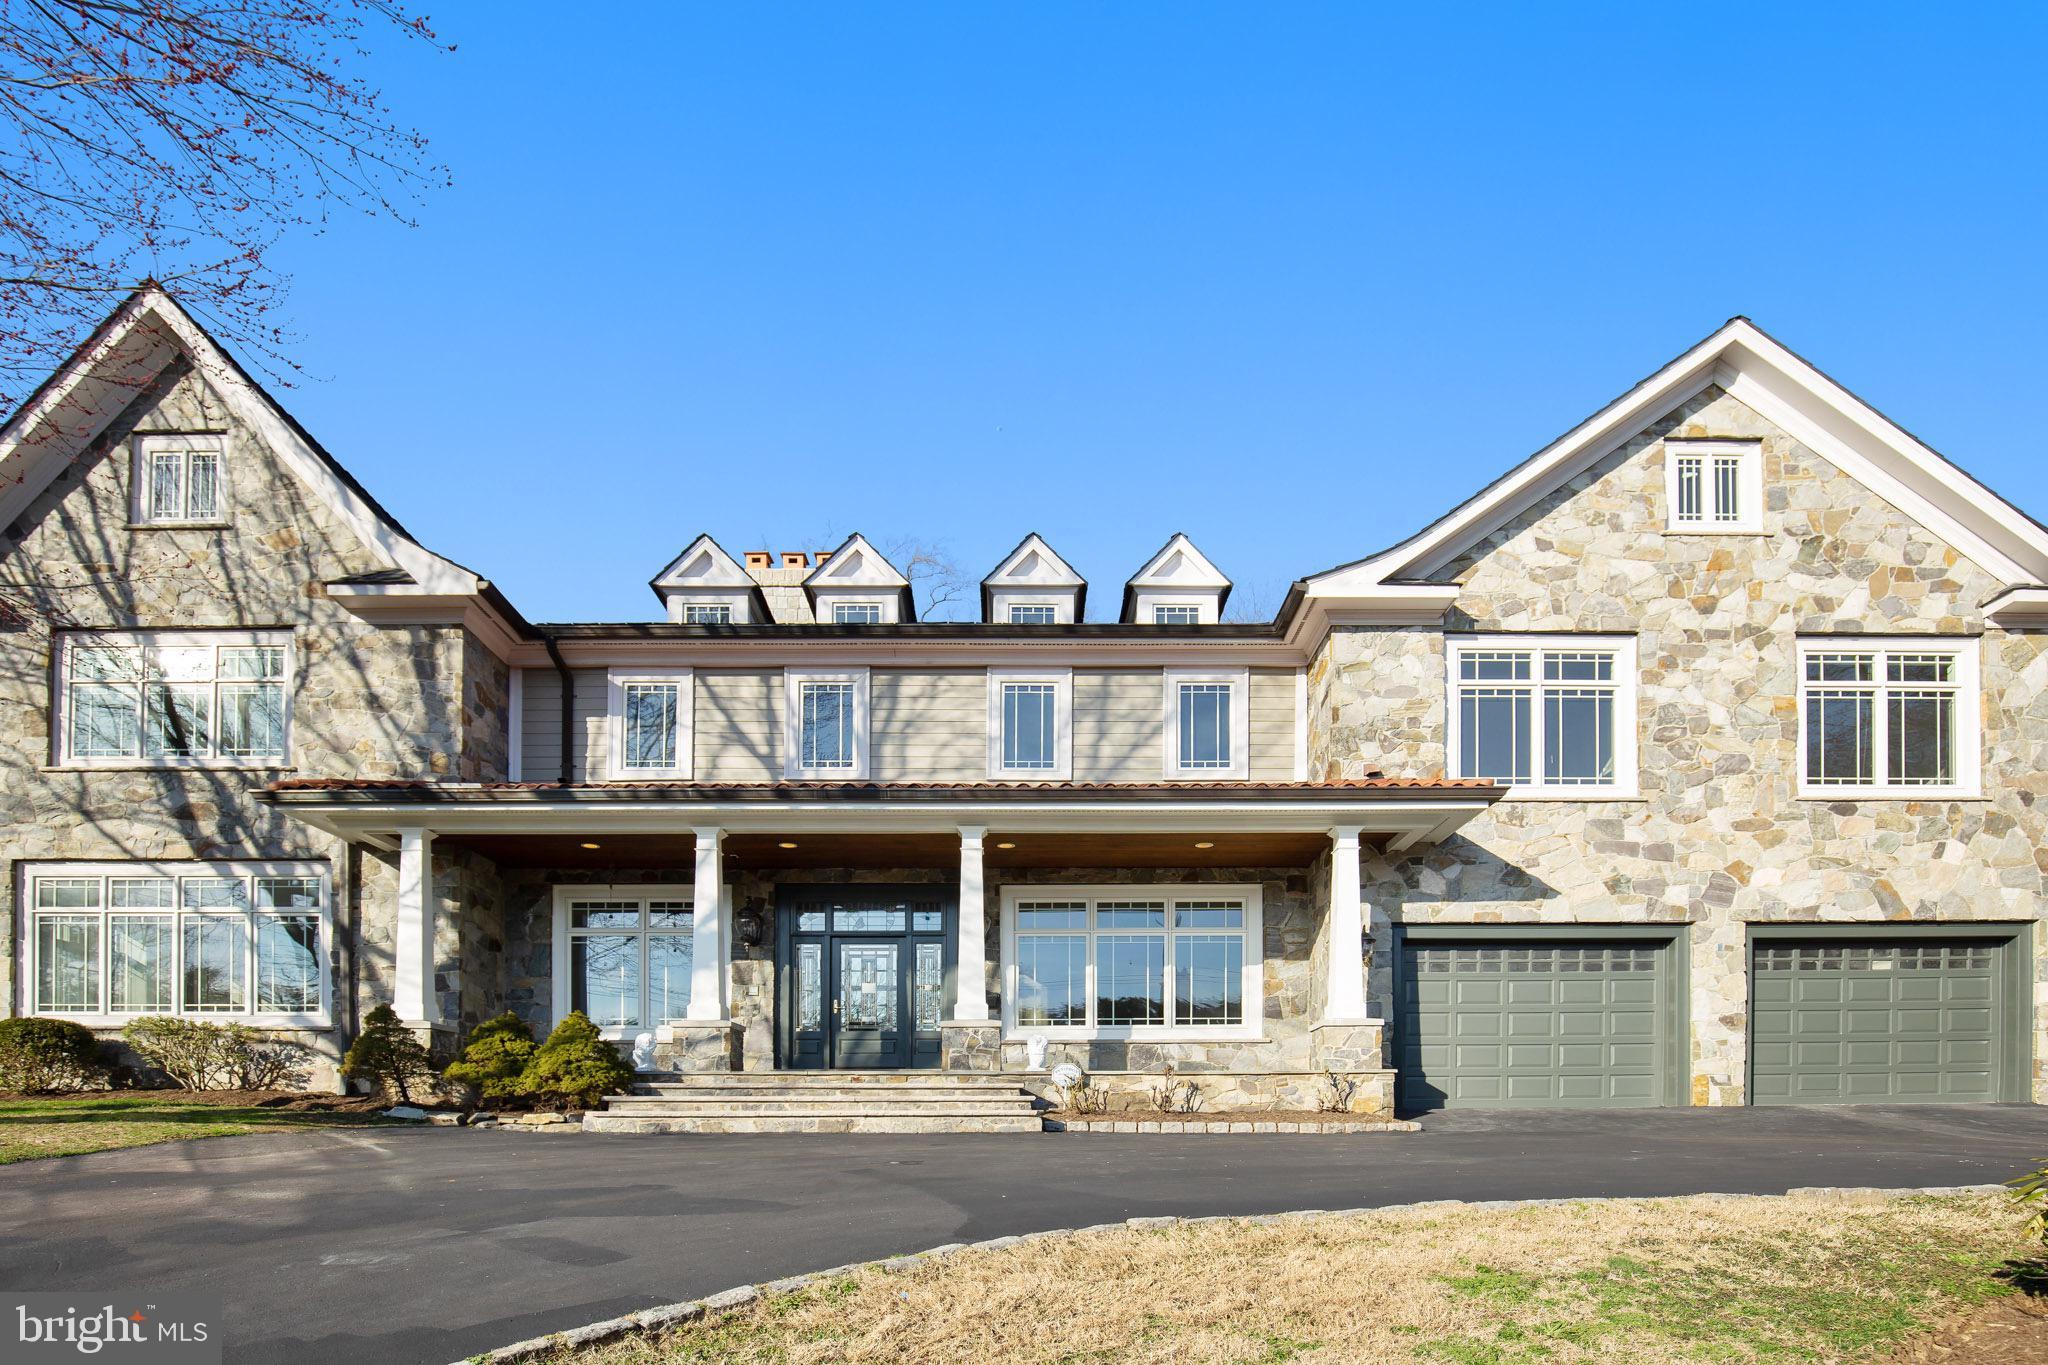 5823 GOLDSBORO ROAD, BETHESDA, Maryland 20817, 7 Bedrooms Bedrooms, ,7 BathroomsBathrooms,Single Family,For Sale,5823 GOLDSBORO ROAD,MDMC2000388